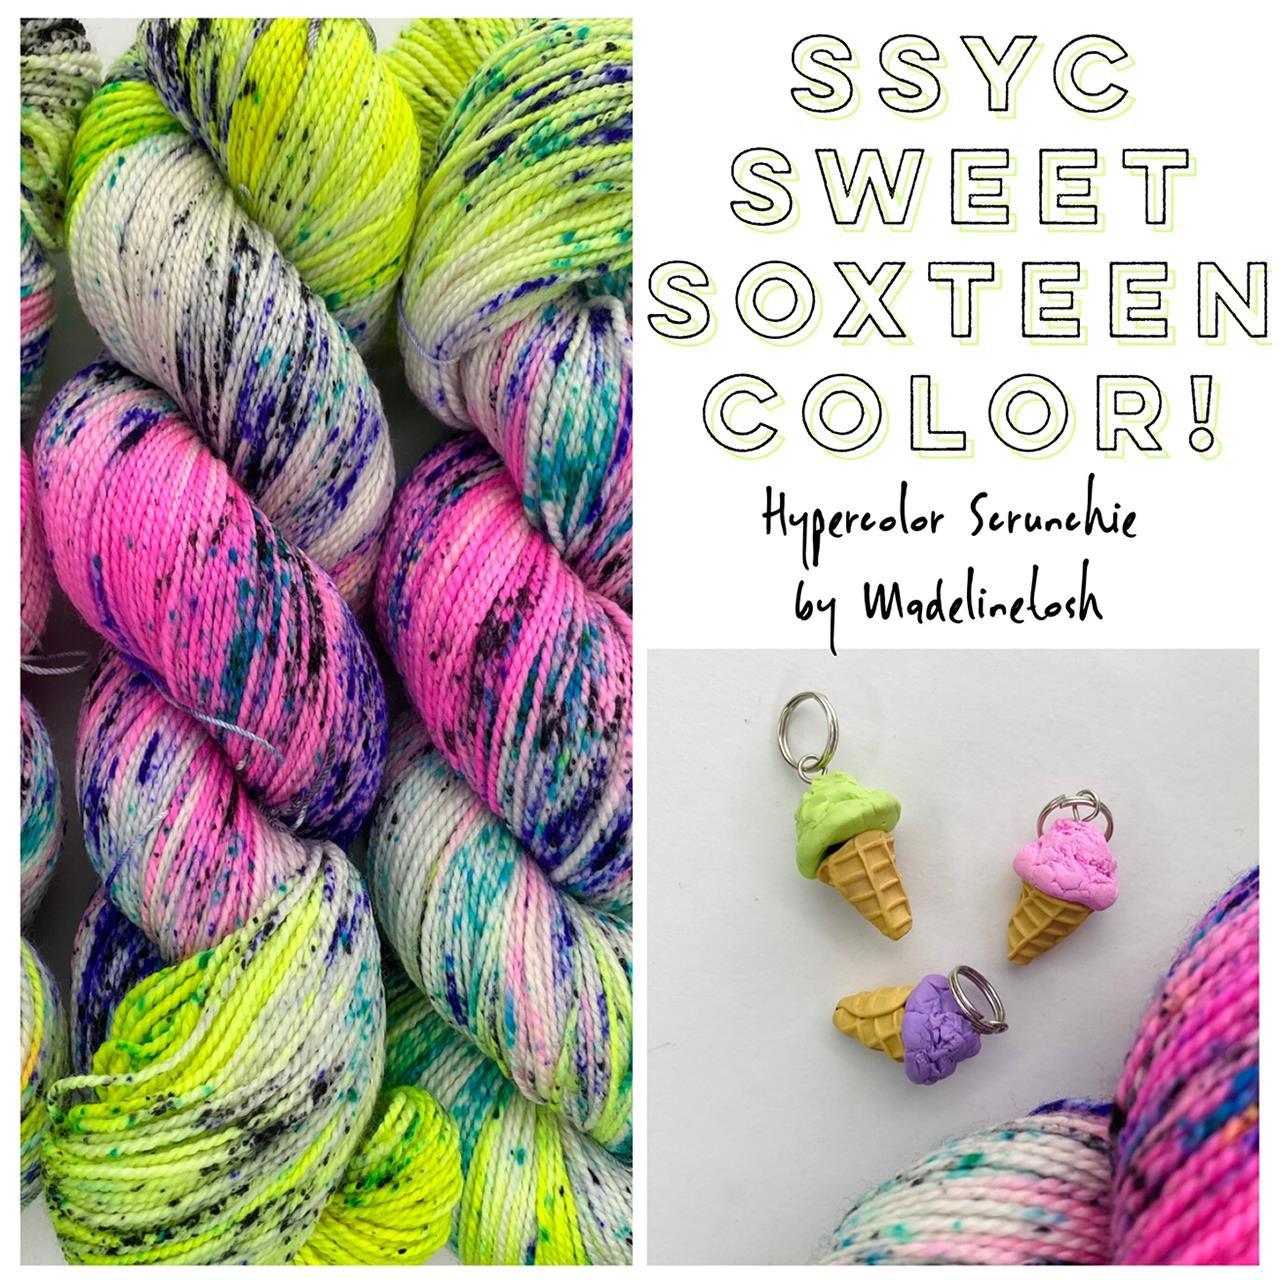 SSYC Sweet Soxteen - 1 -